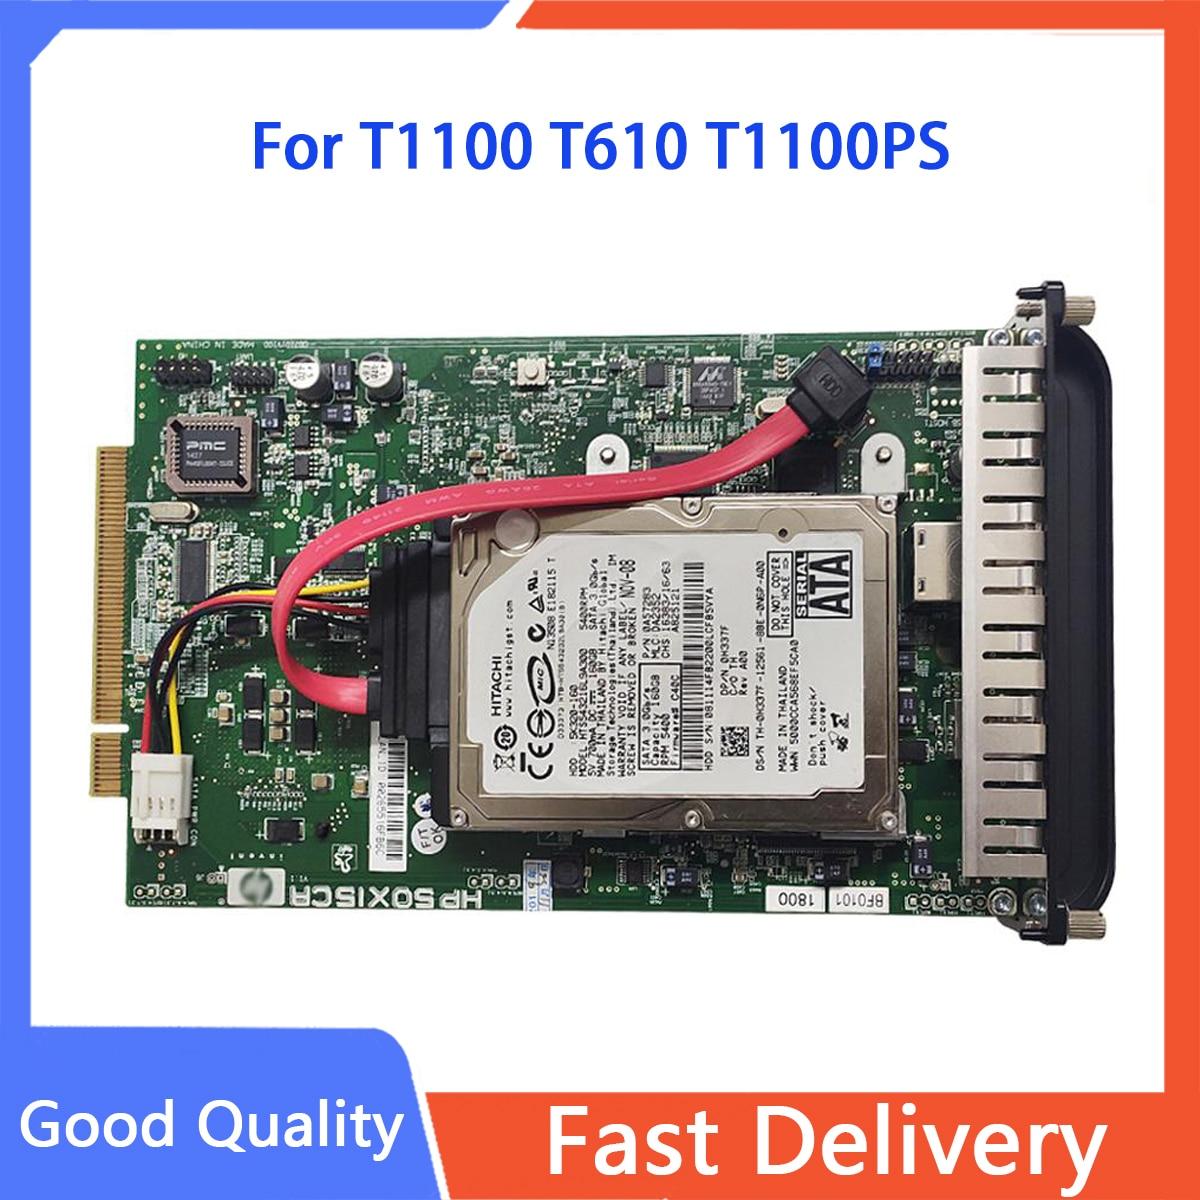 Q6683-67030 Q6683-60193 اللوحة الأم المنسق بطاقة صالح لل طابعة تصميم إتش بي T1100 T610 T1100PS المنسق مجلس و HDD أجزاء جهاز رسم بياني